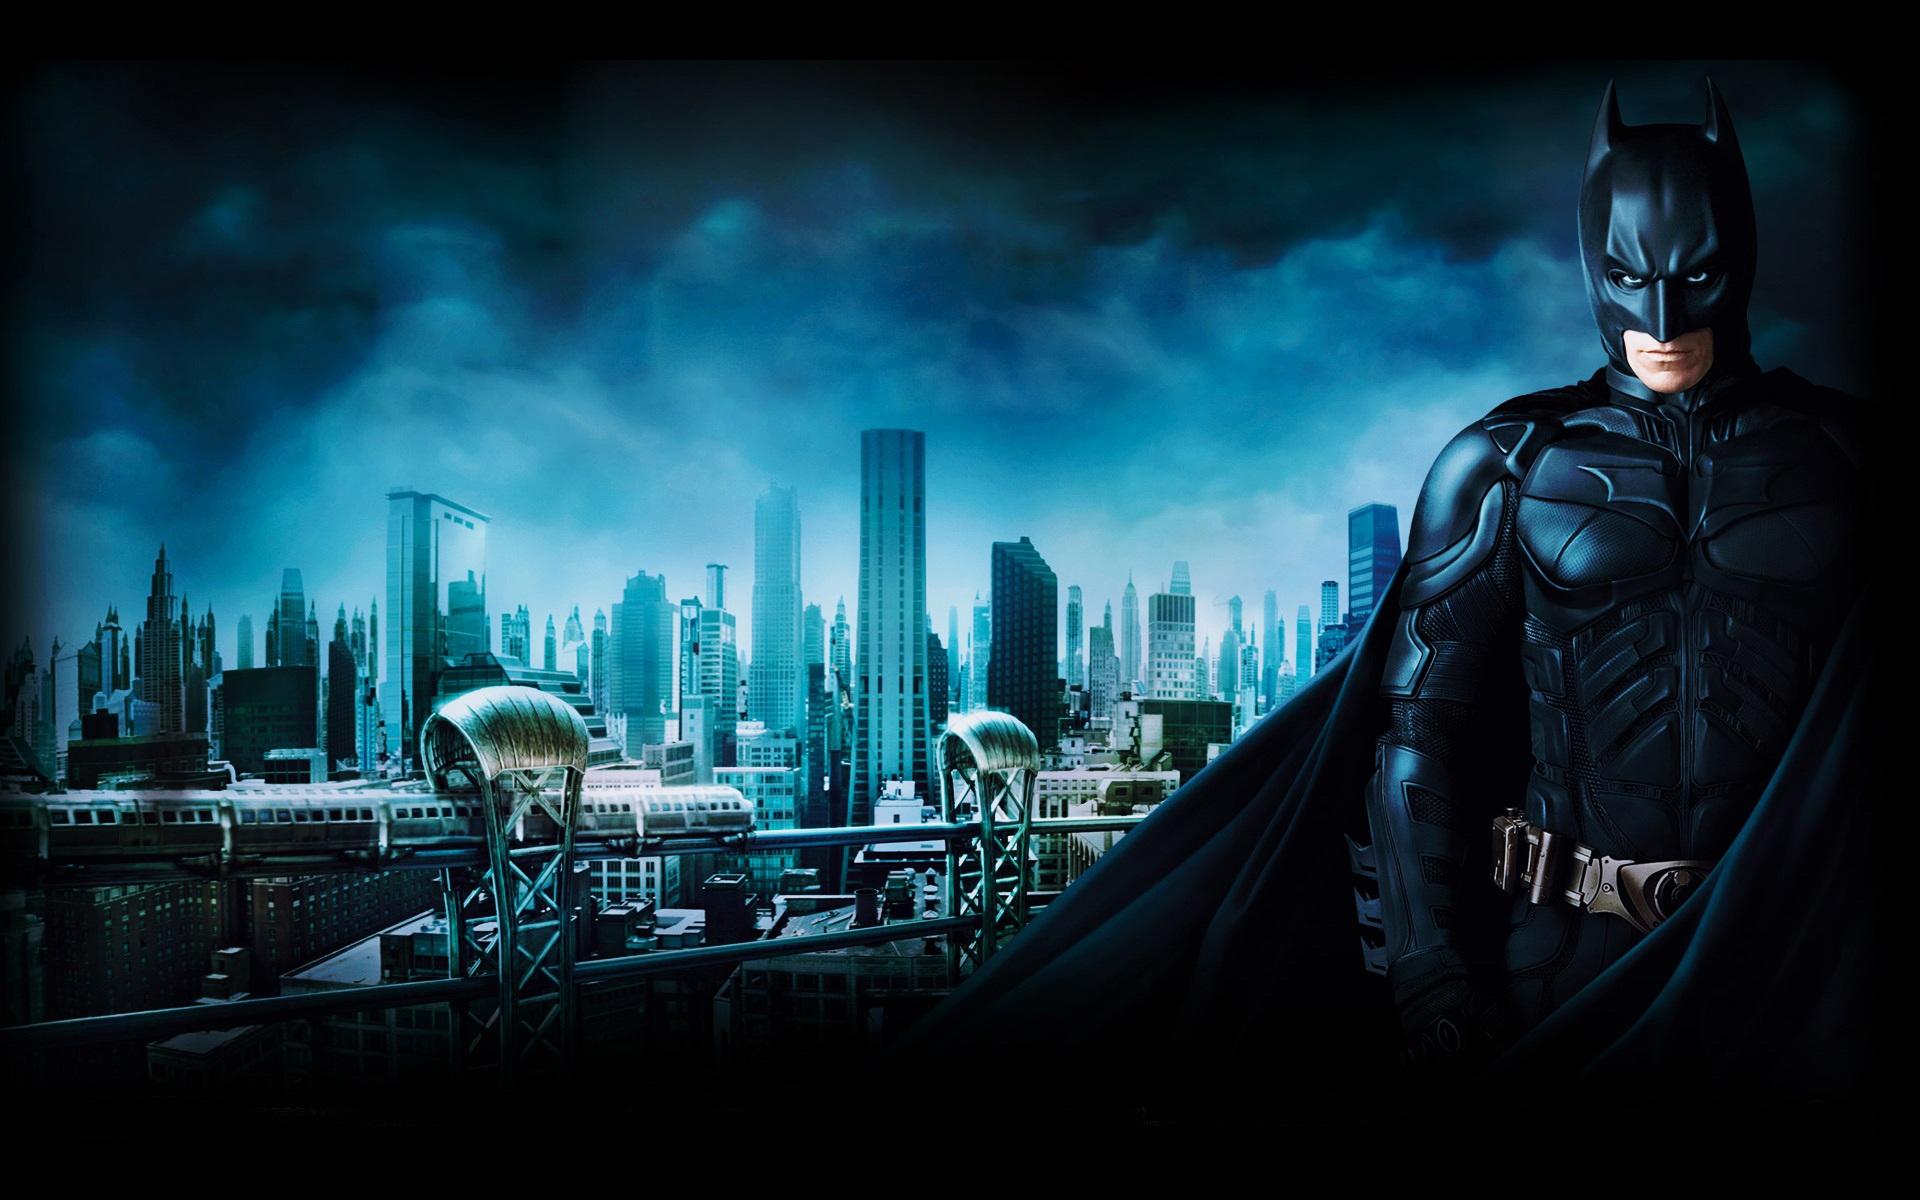 Thanksgiving Wallpaper Hd Batman Wallpaper Hd Download Free Pixelstalk Net